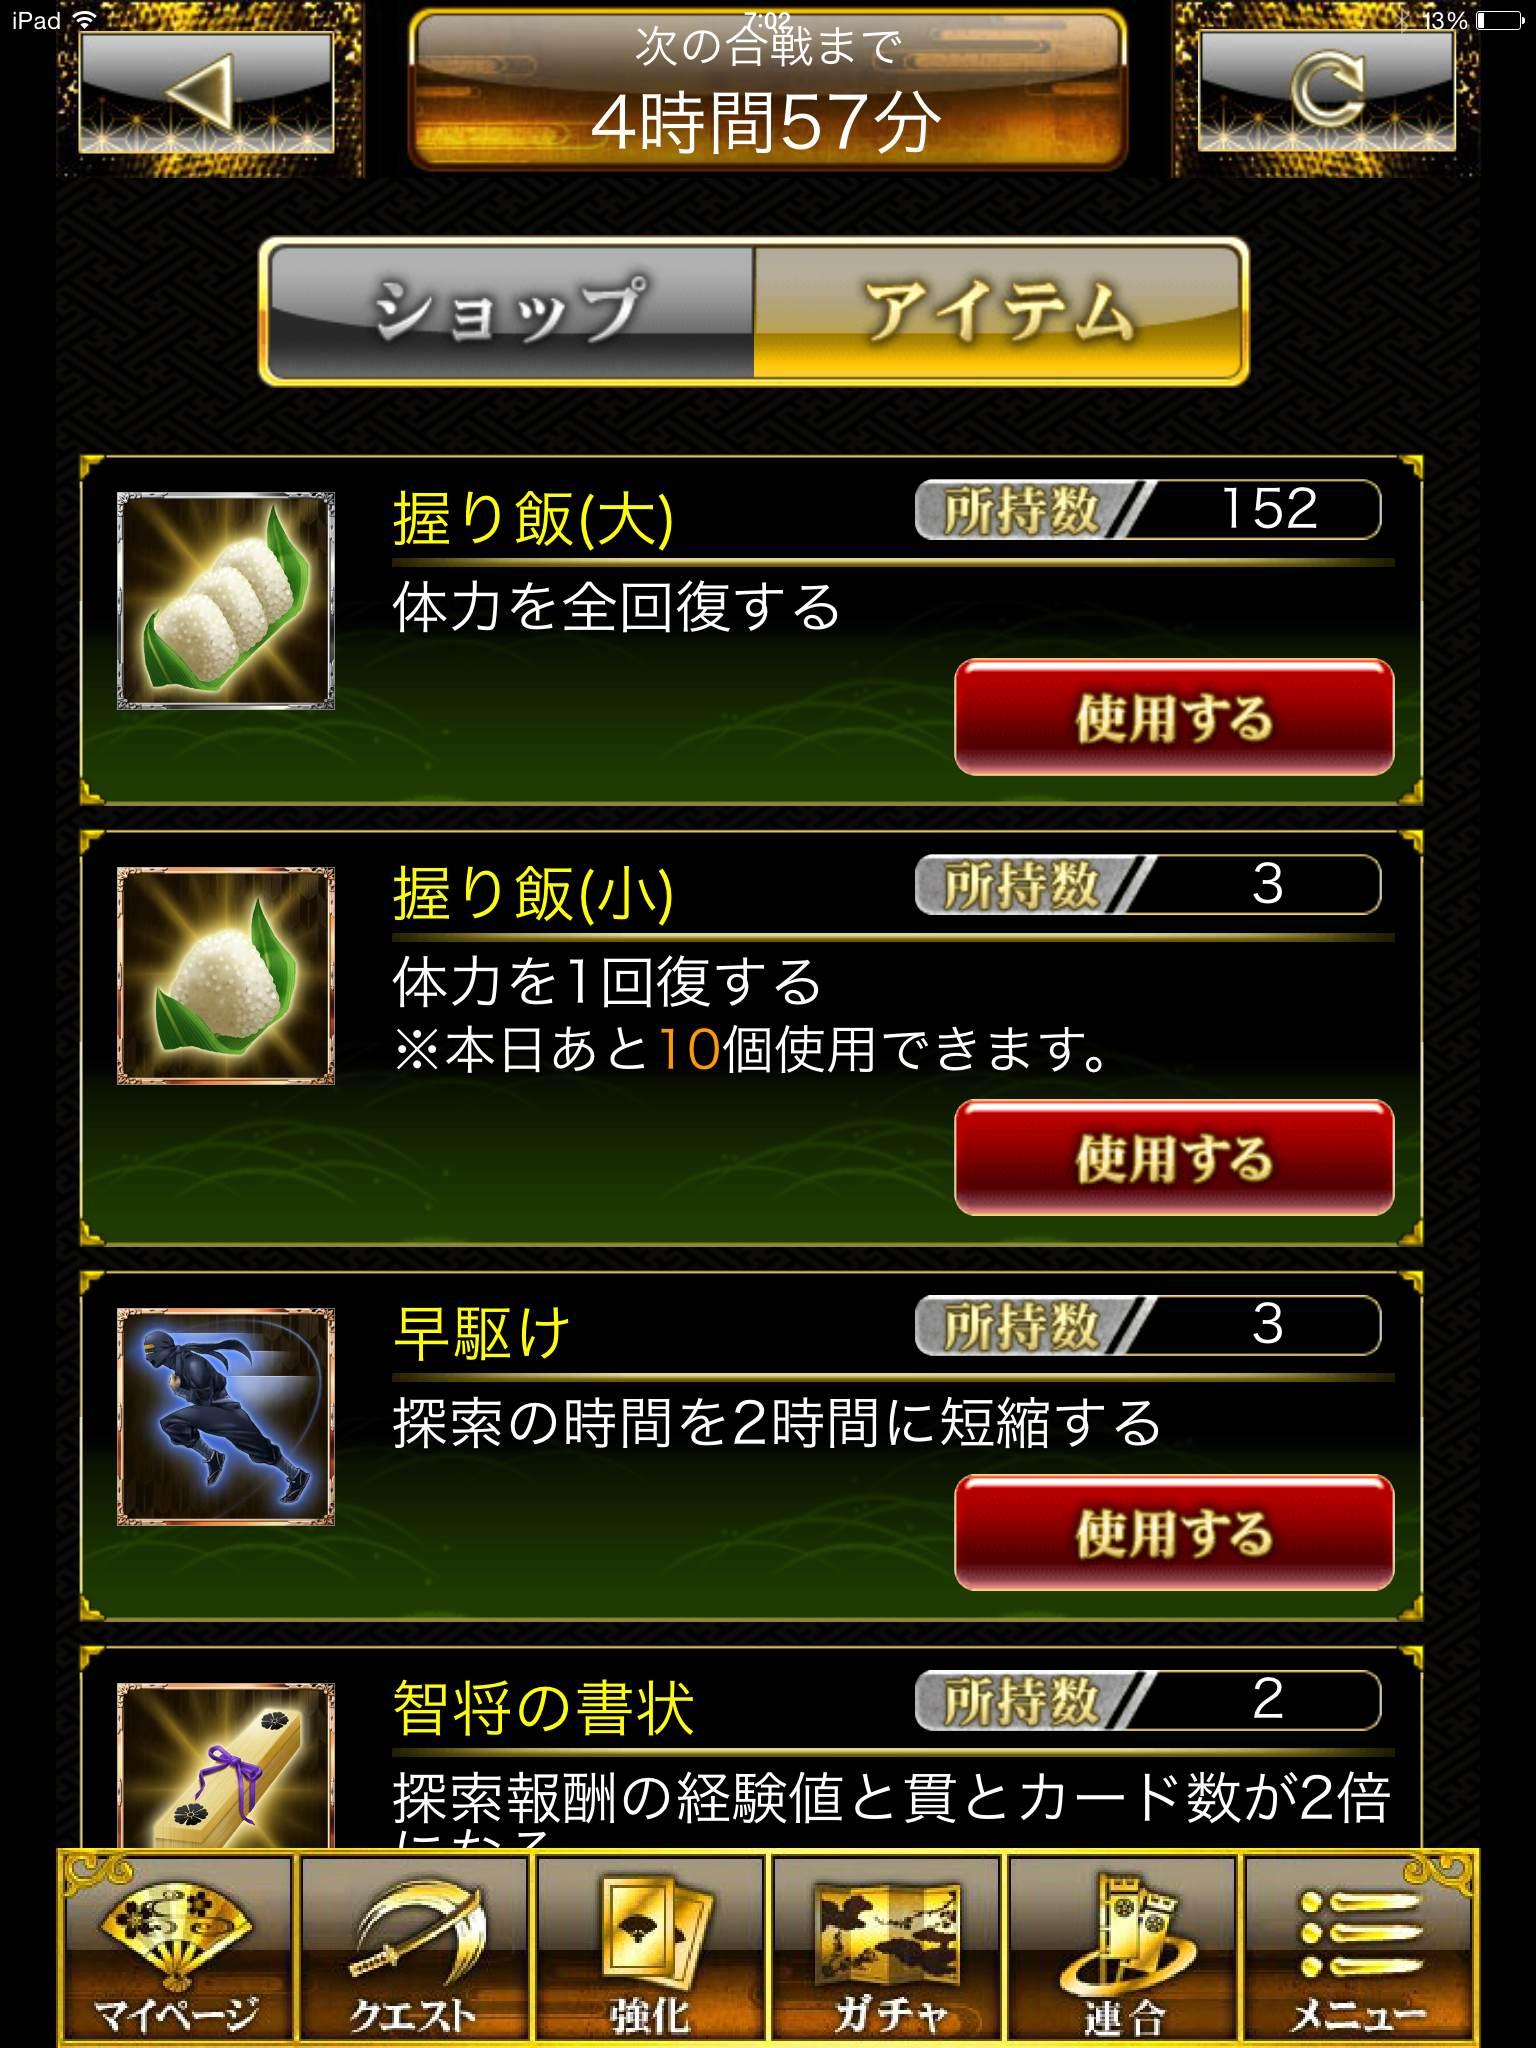 onigirinokoriryou.jpg